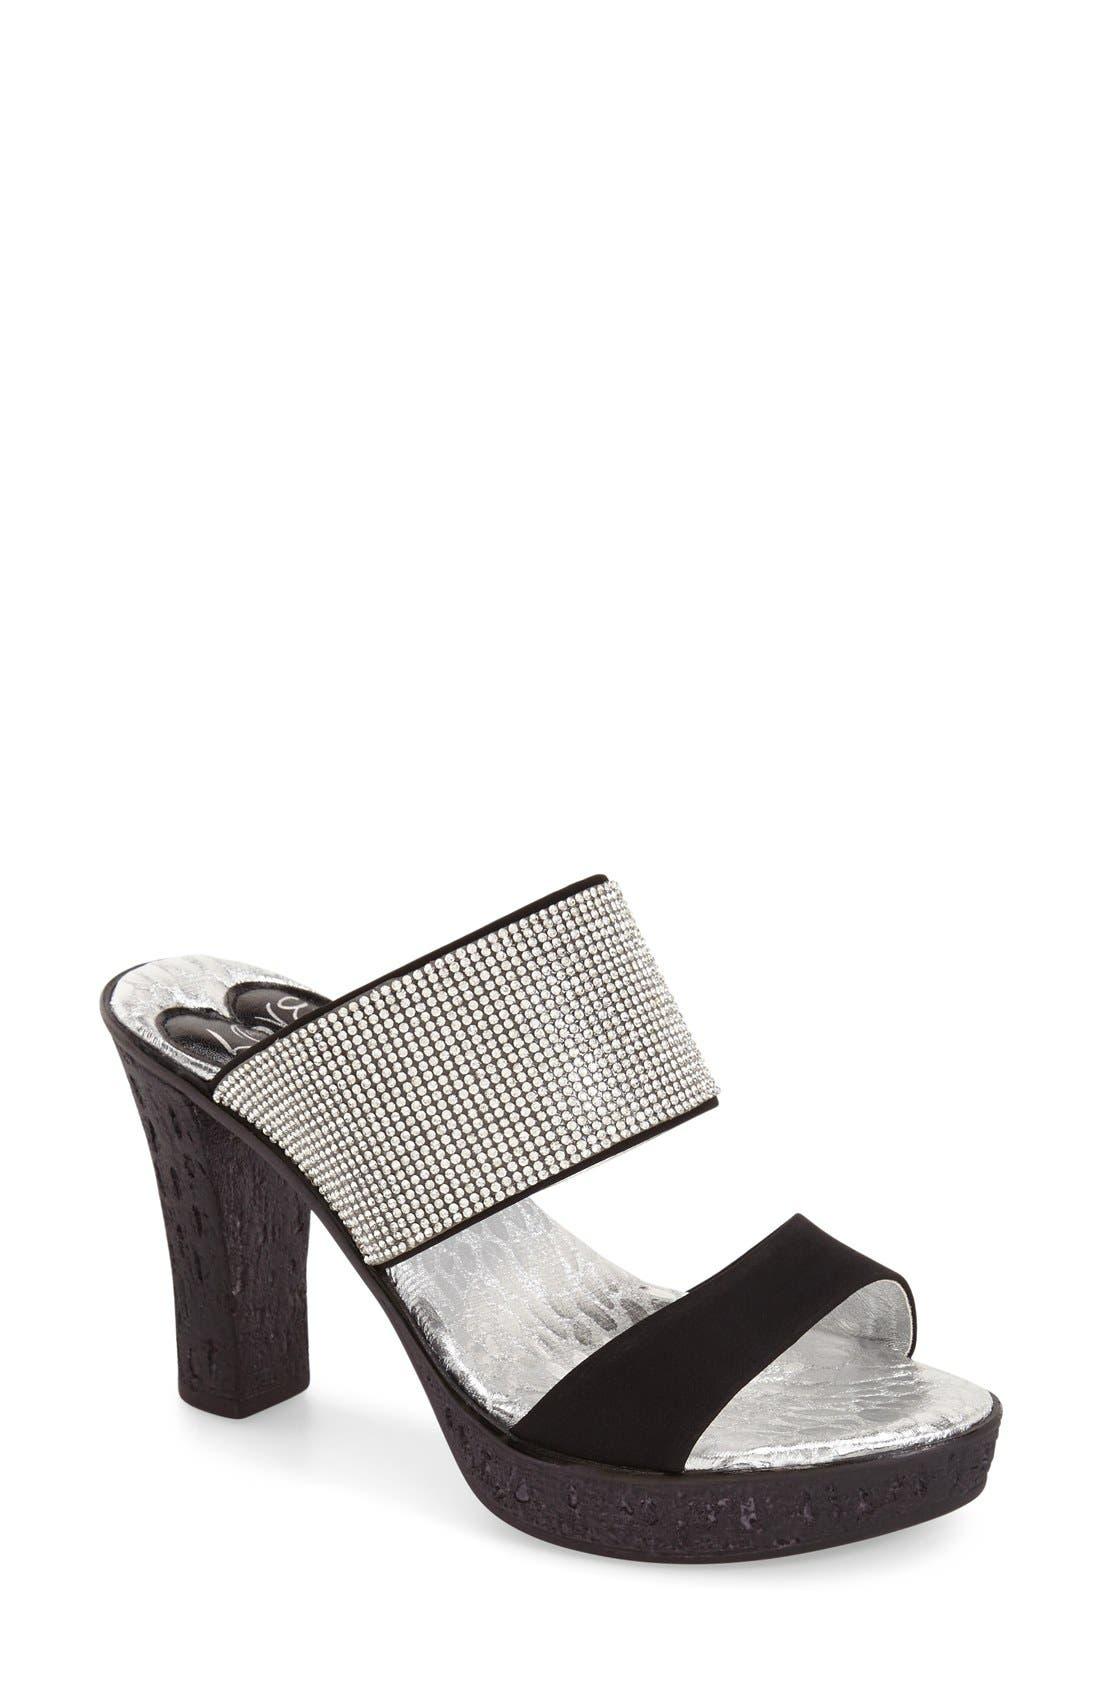 Alternate Image 1 Selected - Love and Liberty 'Dakota' Crystal Embellished Double Band Sandal (Women)